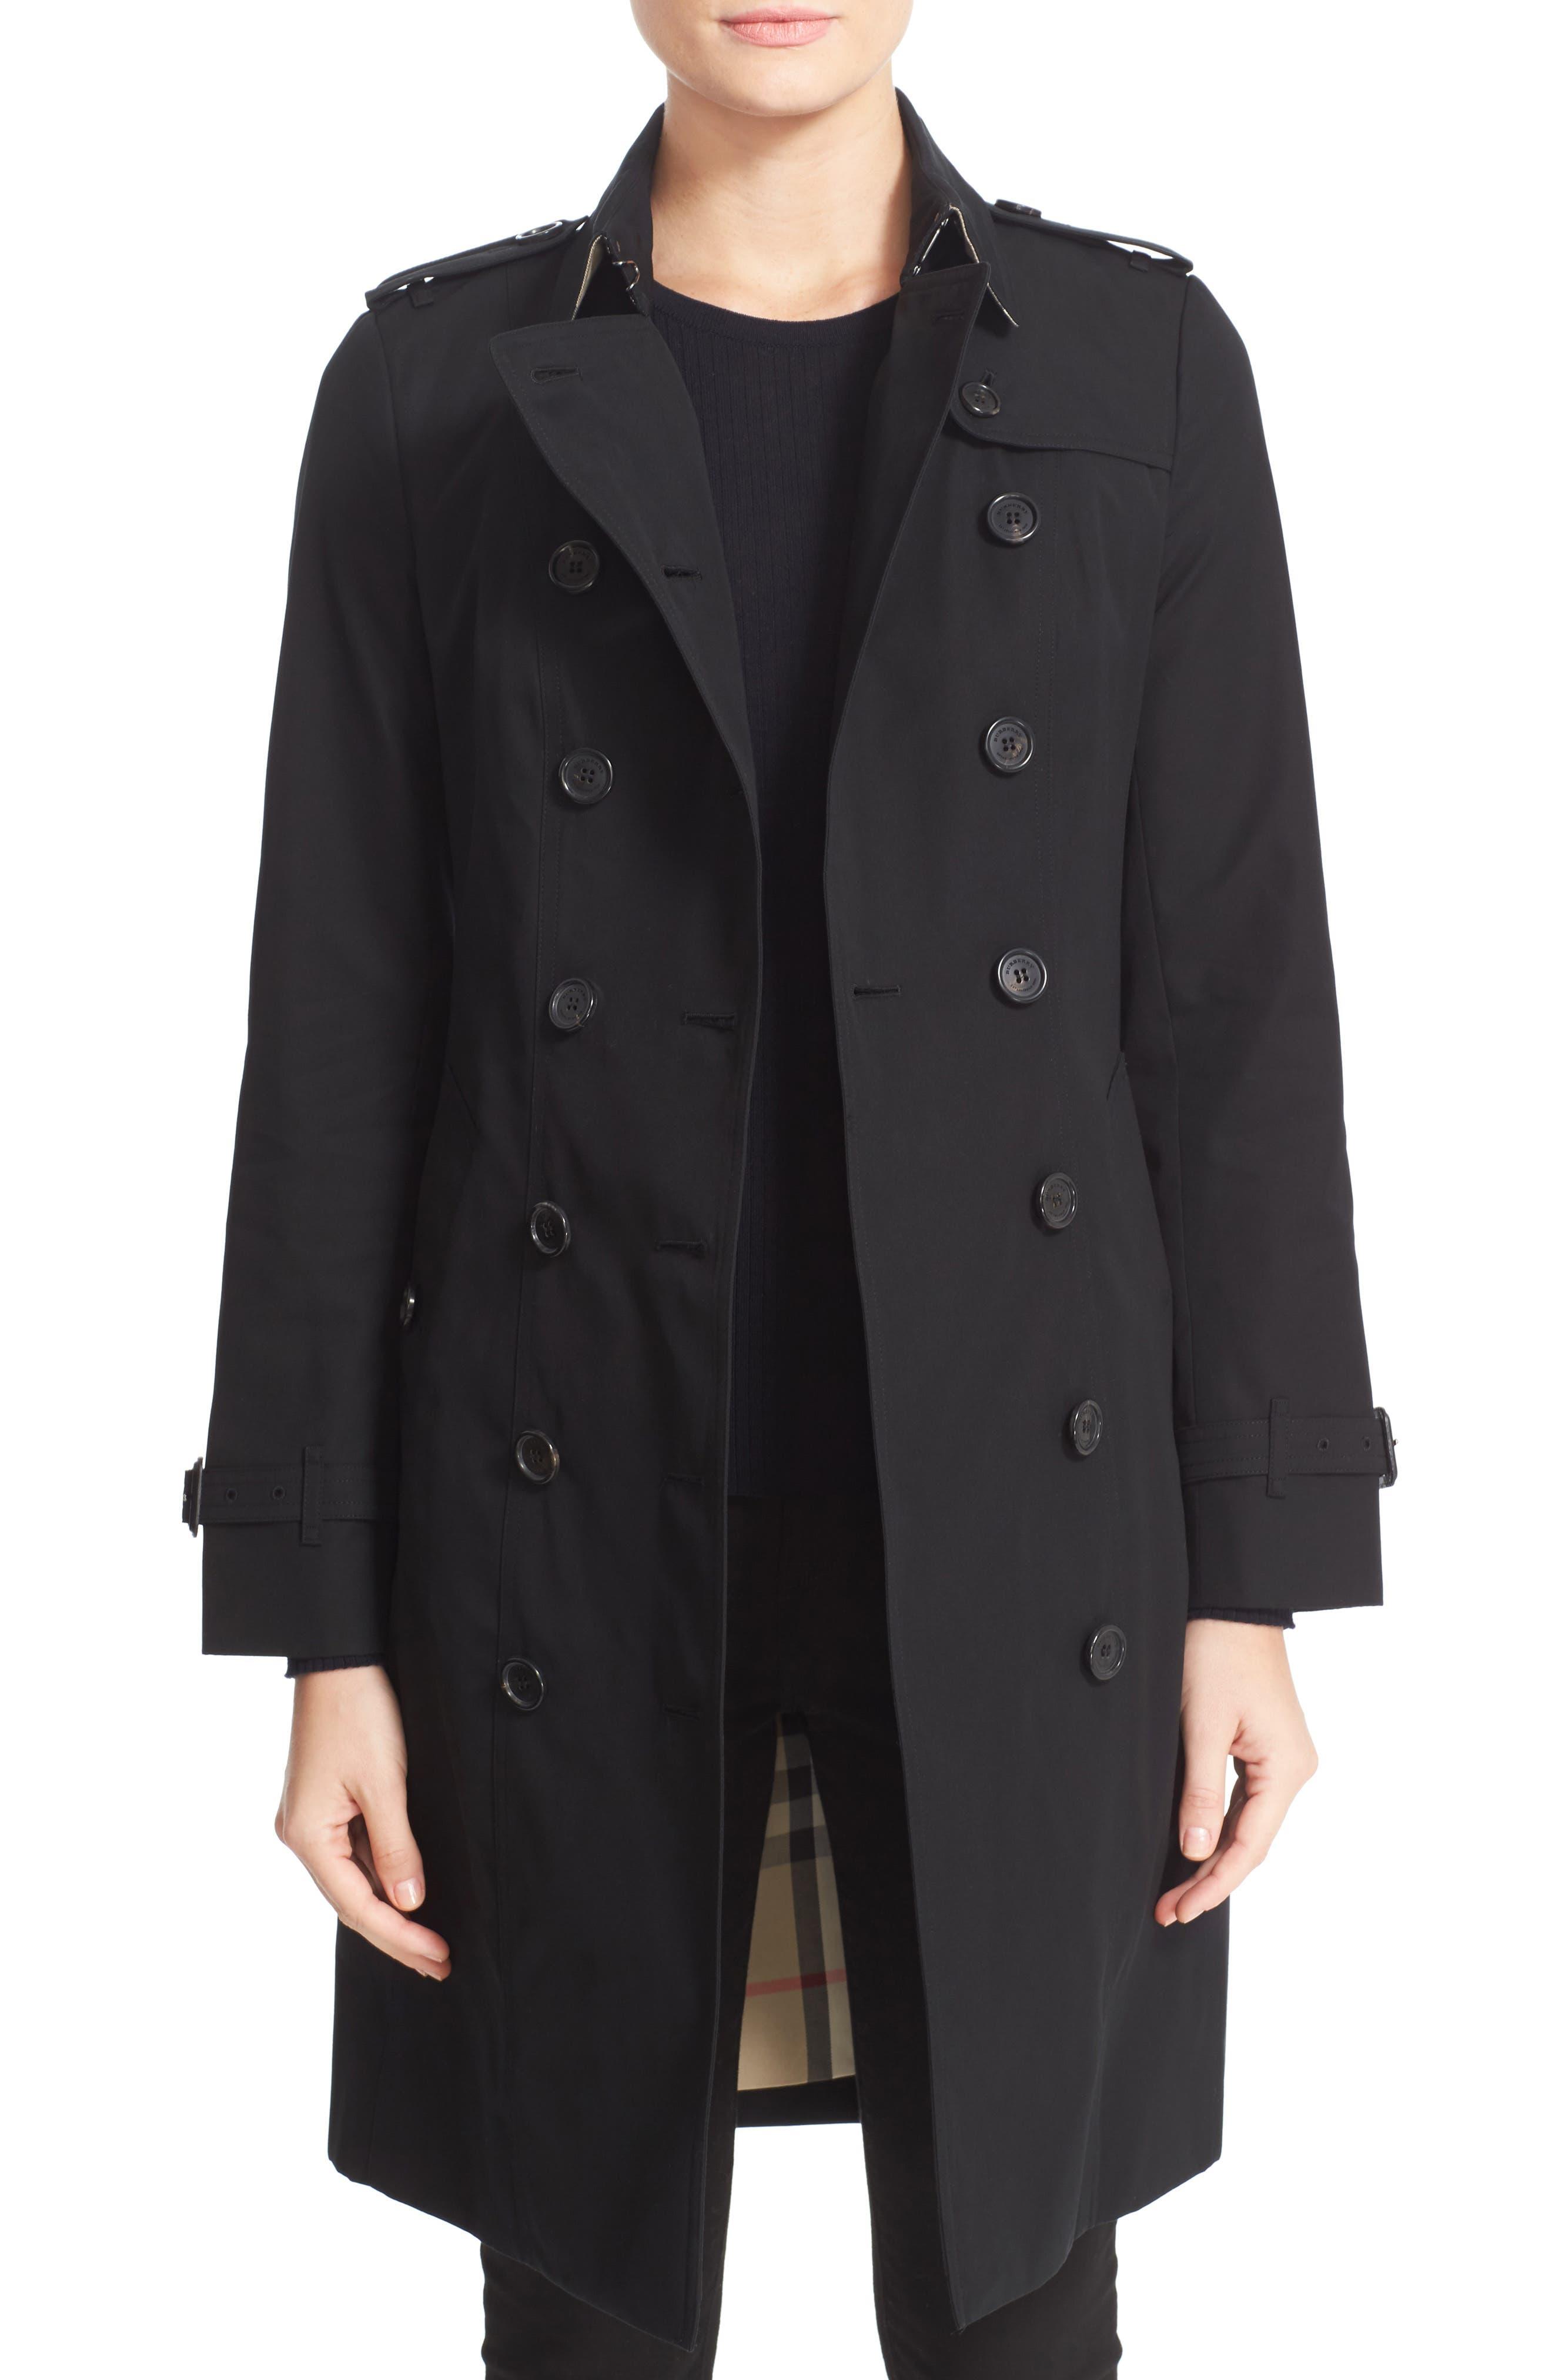 BURBERRY Sandringham Long Slim Trench Coat, Main, color, BLACK